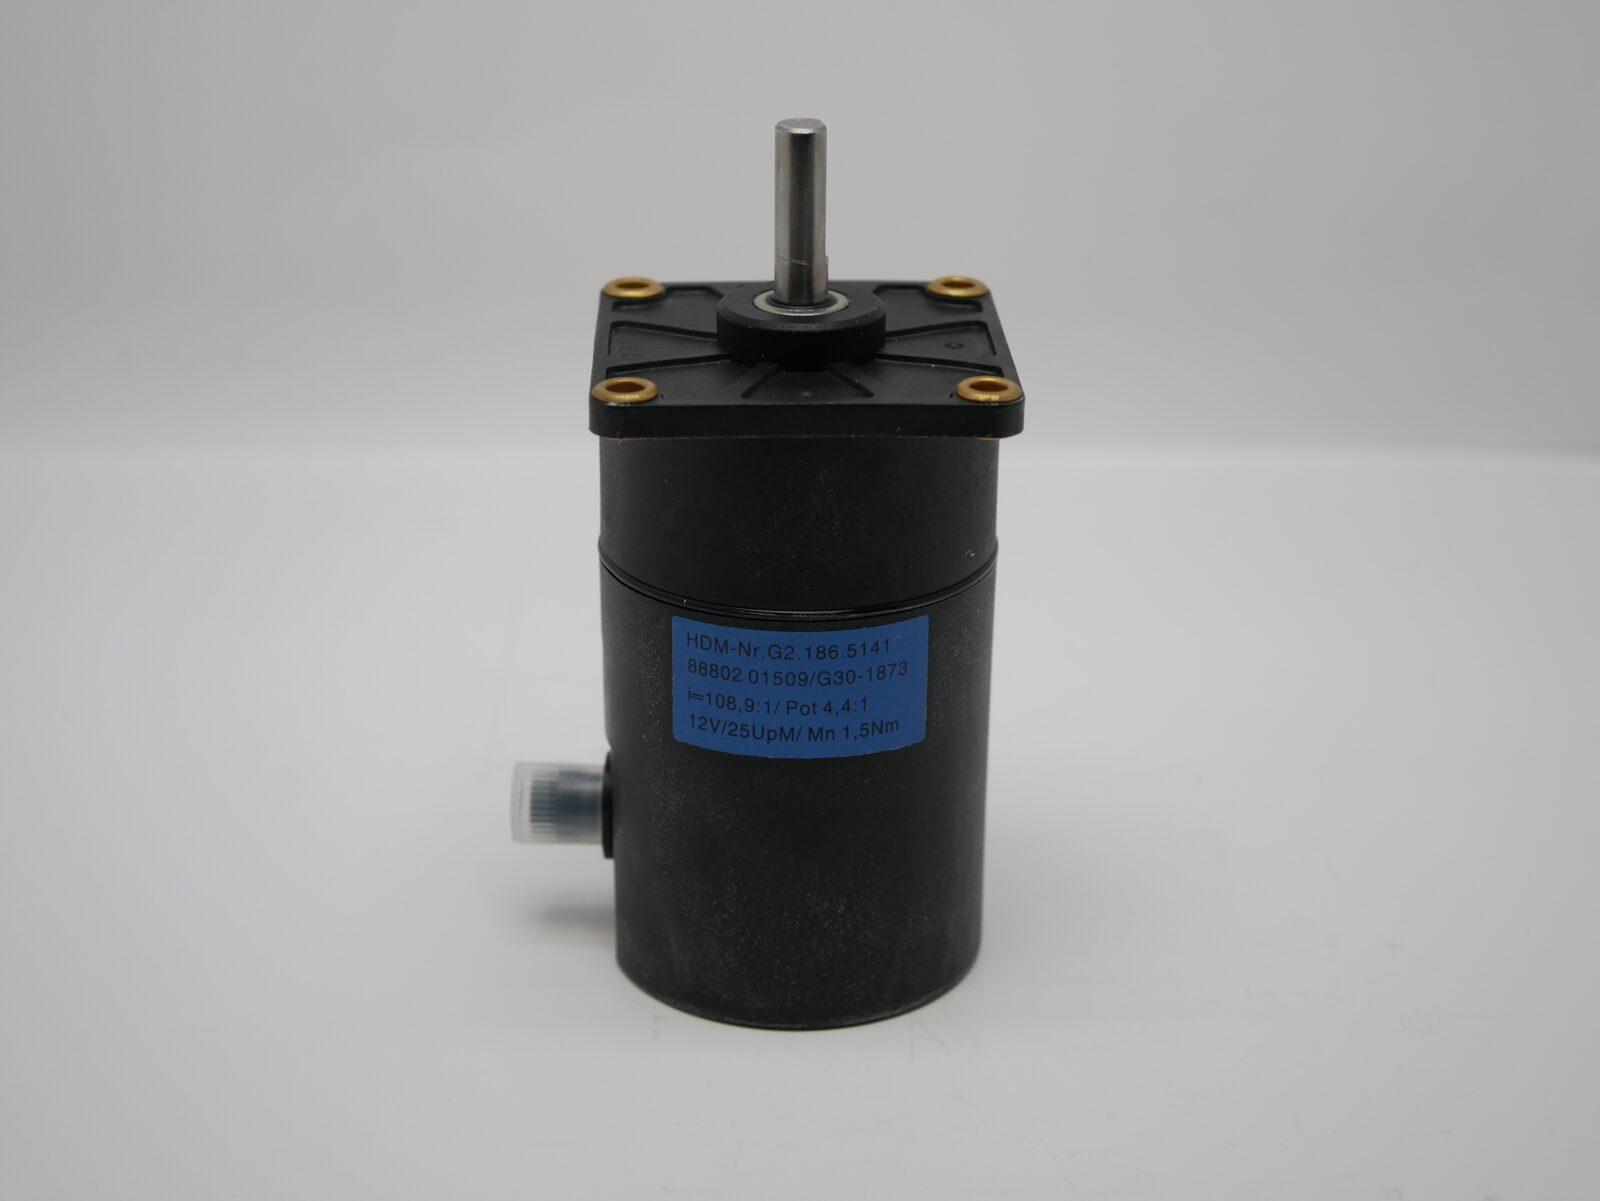 SM/GTO 52 Servo Drive Motor (Blue) HDM: G2.186.5141